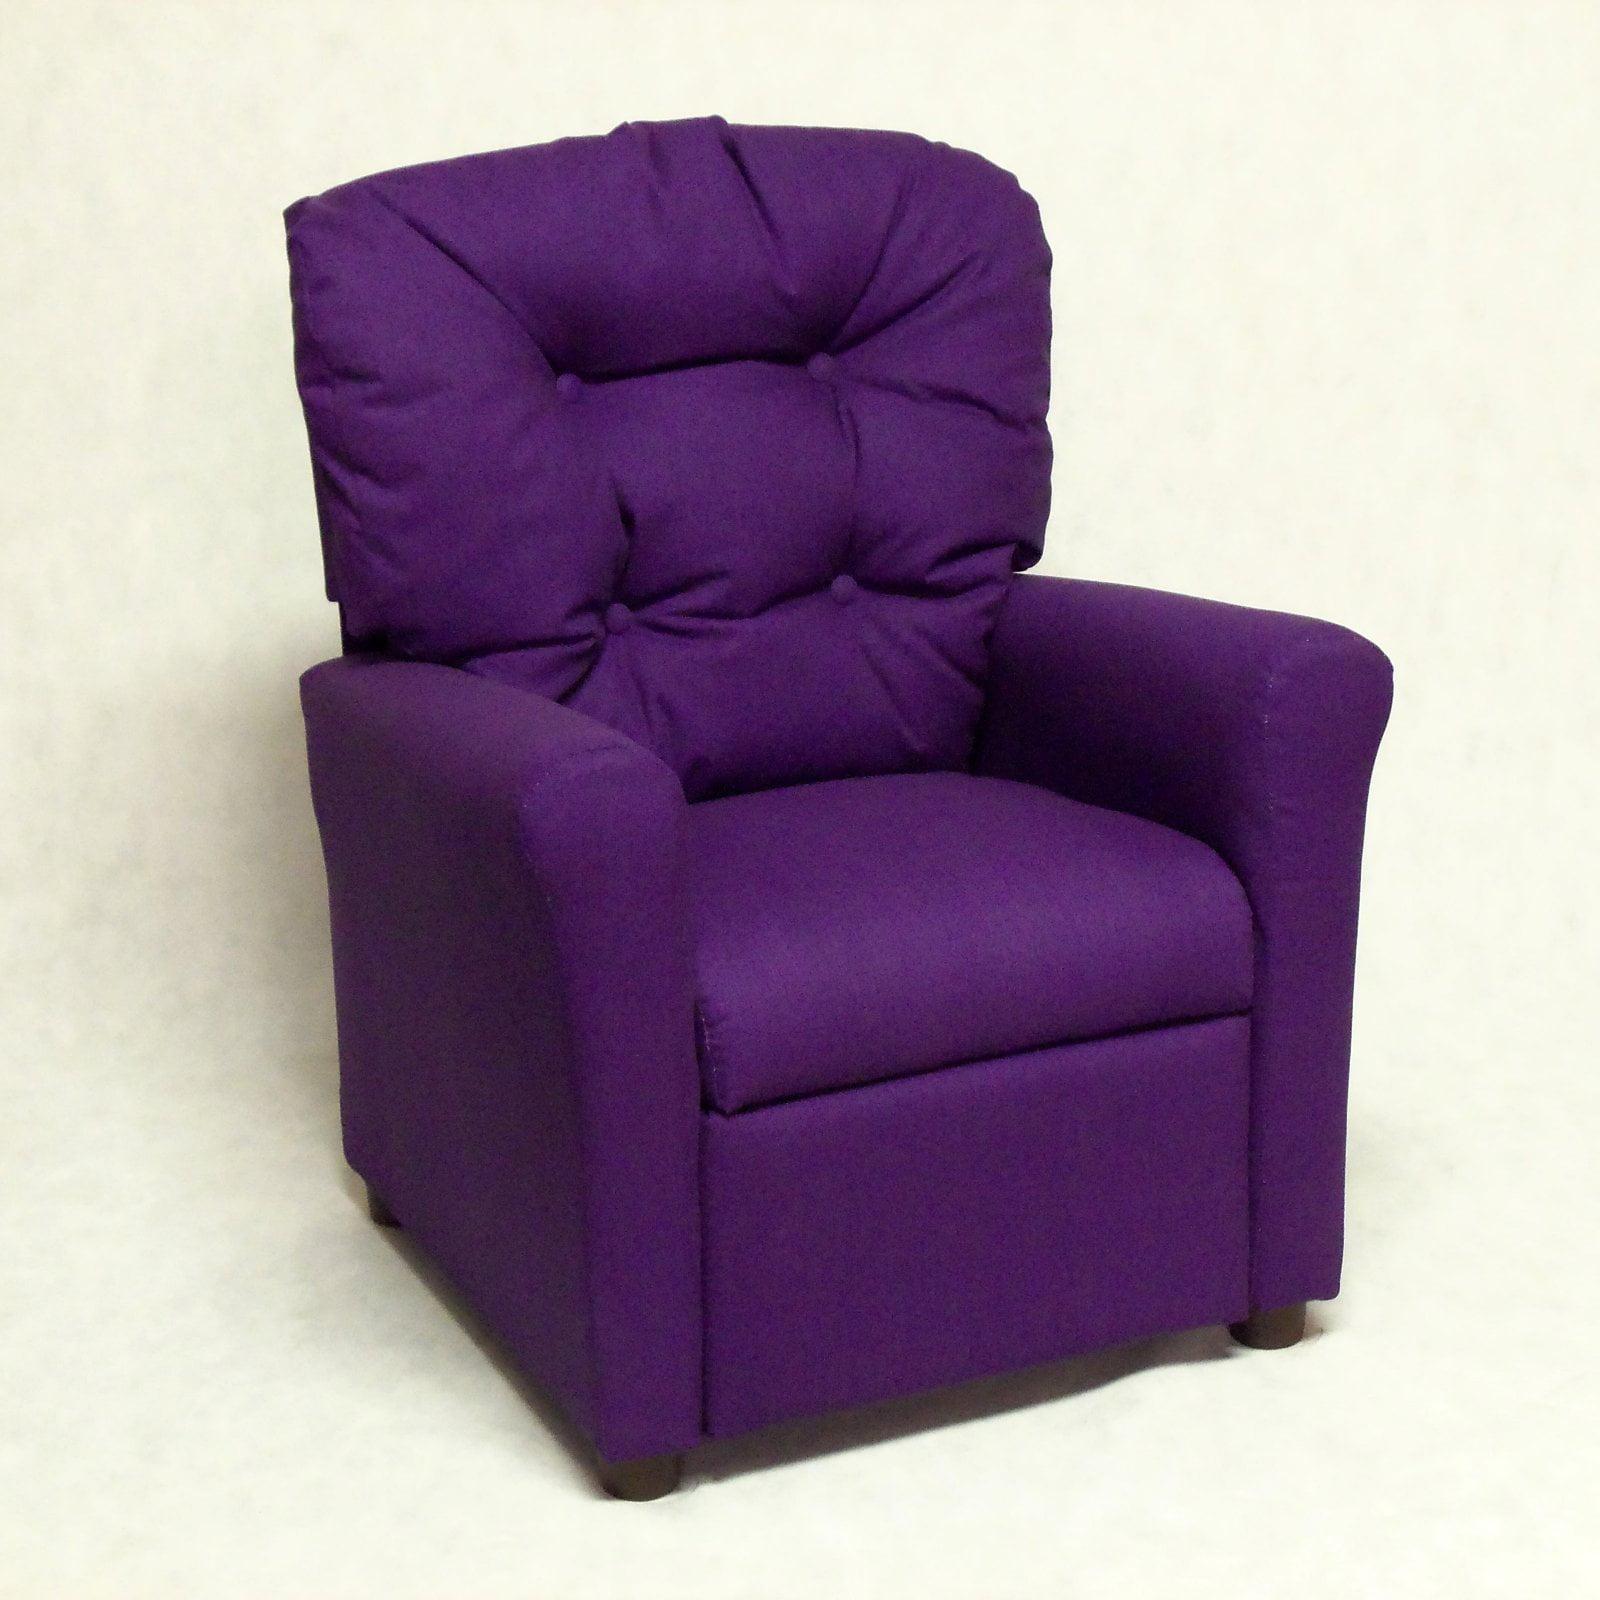 Walmarts Furniture: Brazil Furniture 4-Button Back Child Recliner